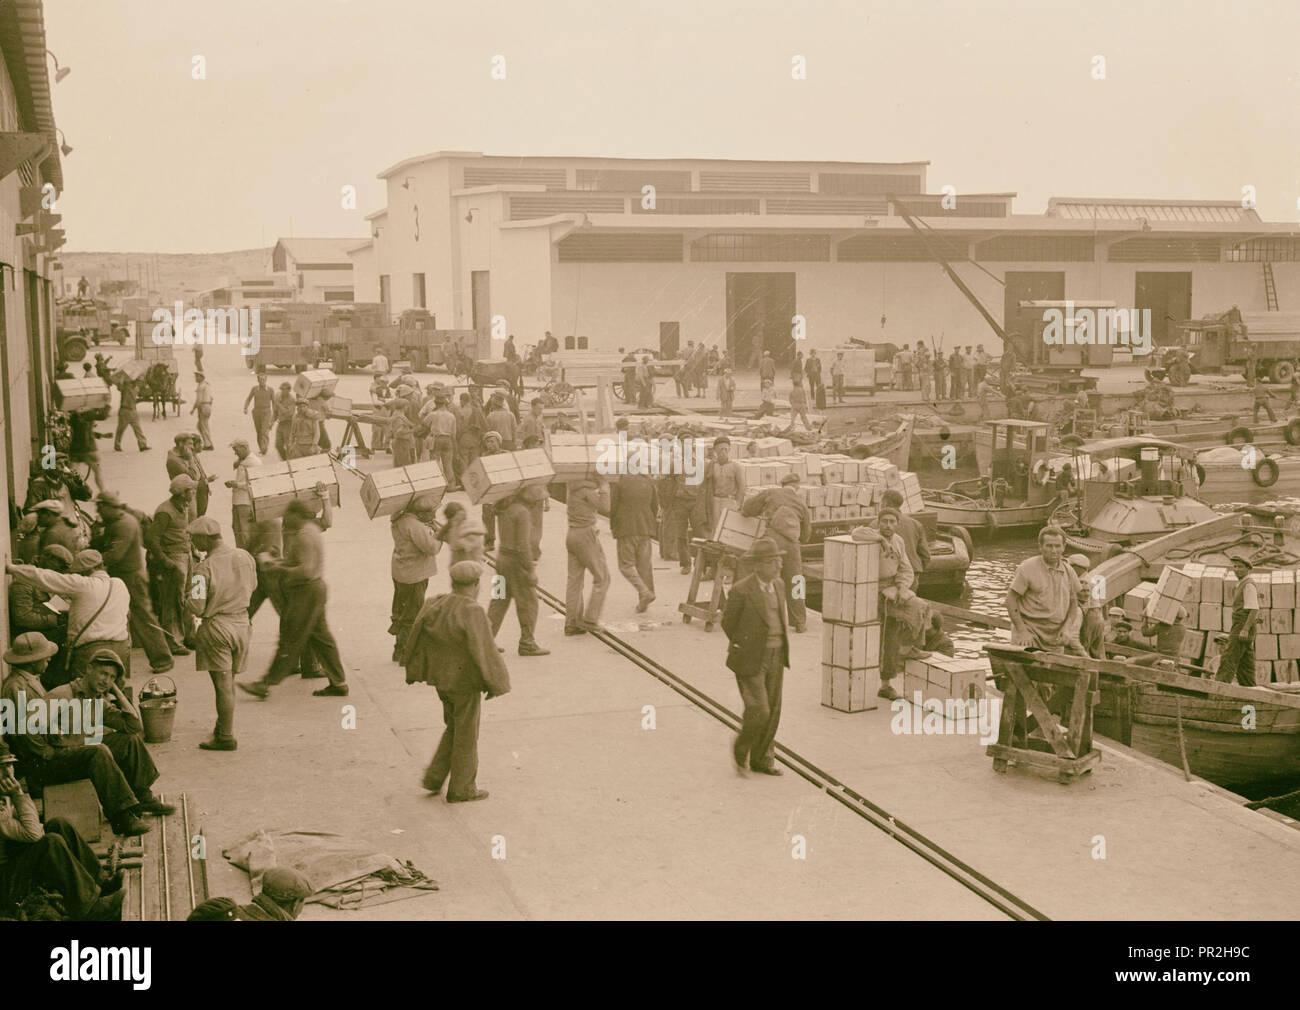 Tel Aviv harbour. A busy scene, loading lighters with orange boxes. 1934, Israel, Tel Aviv - Stock Image